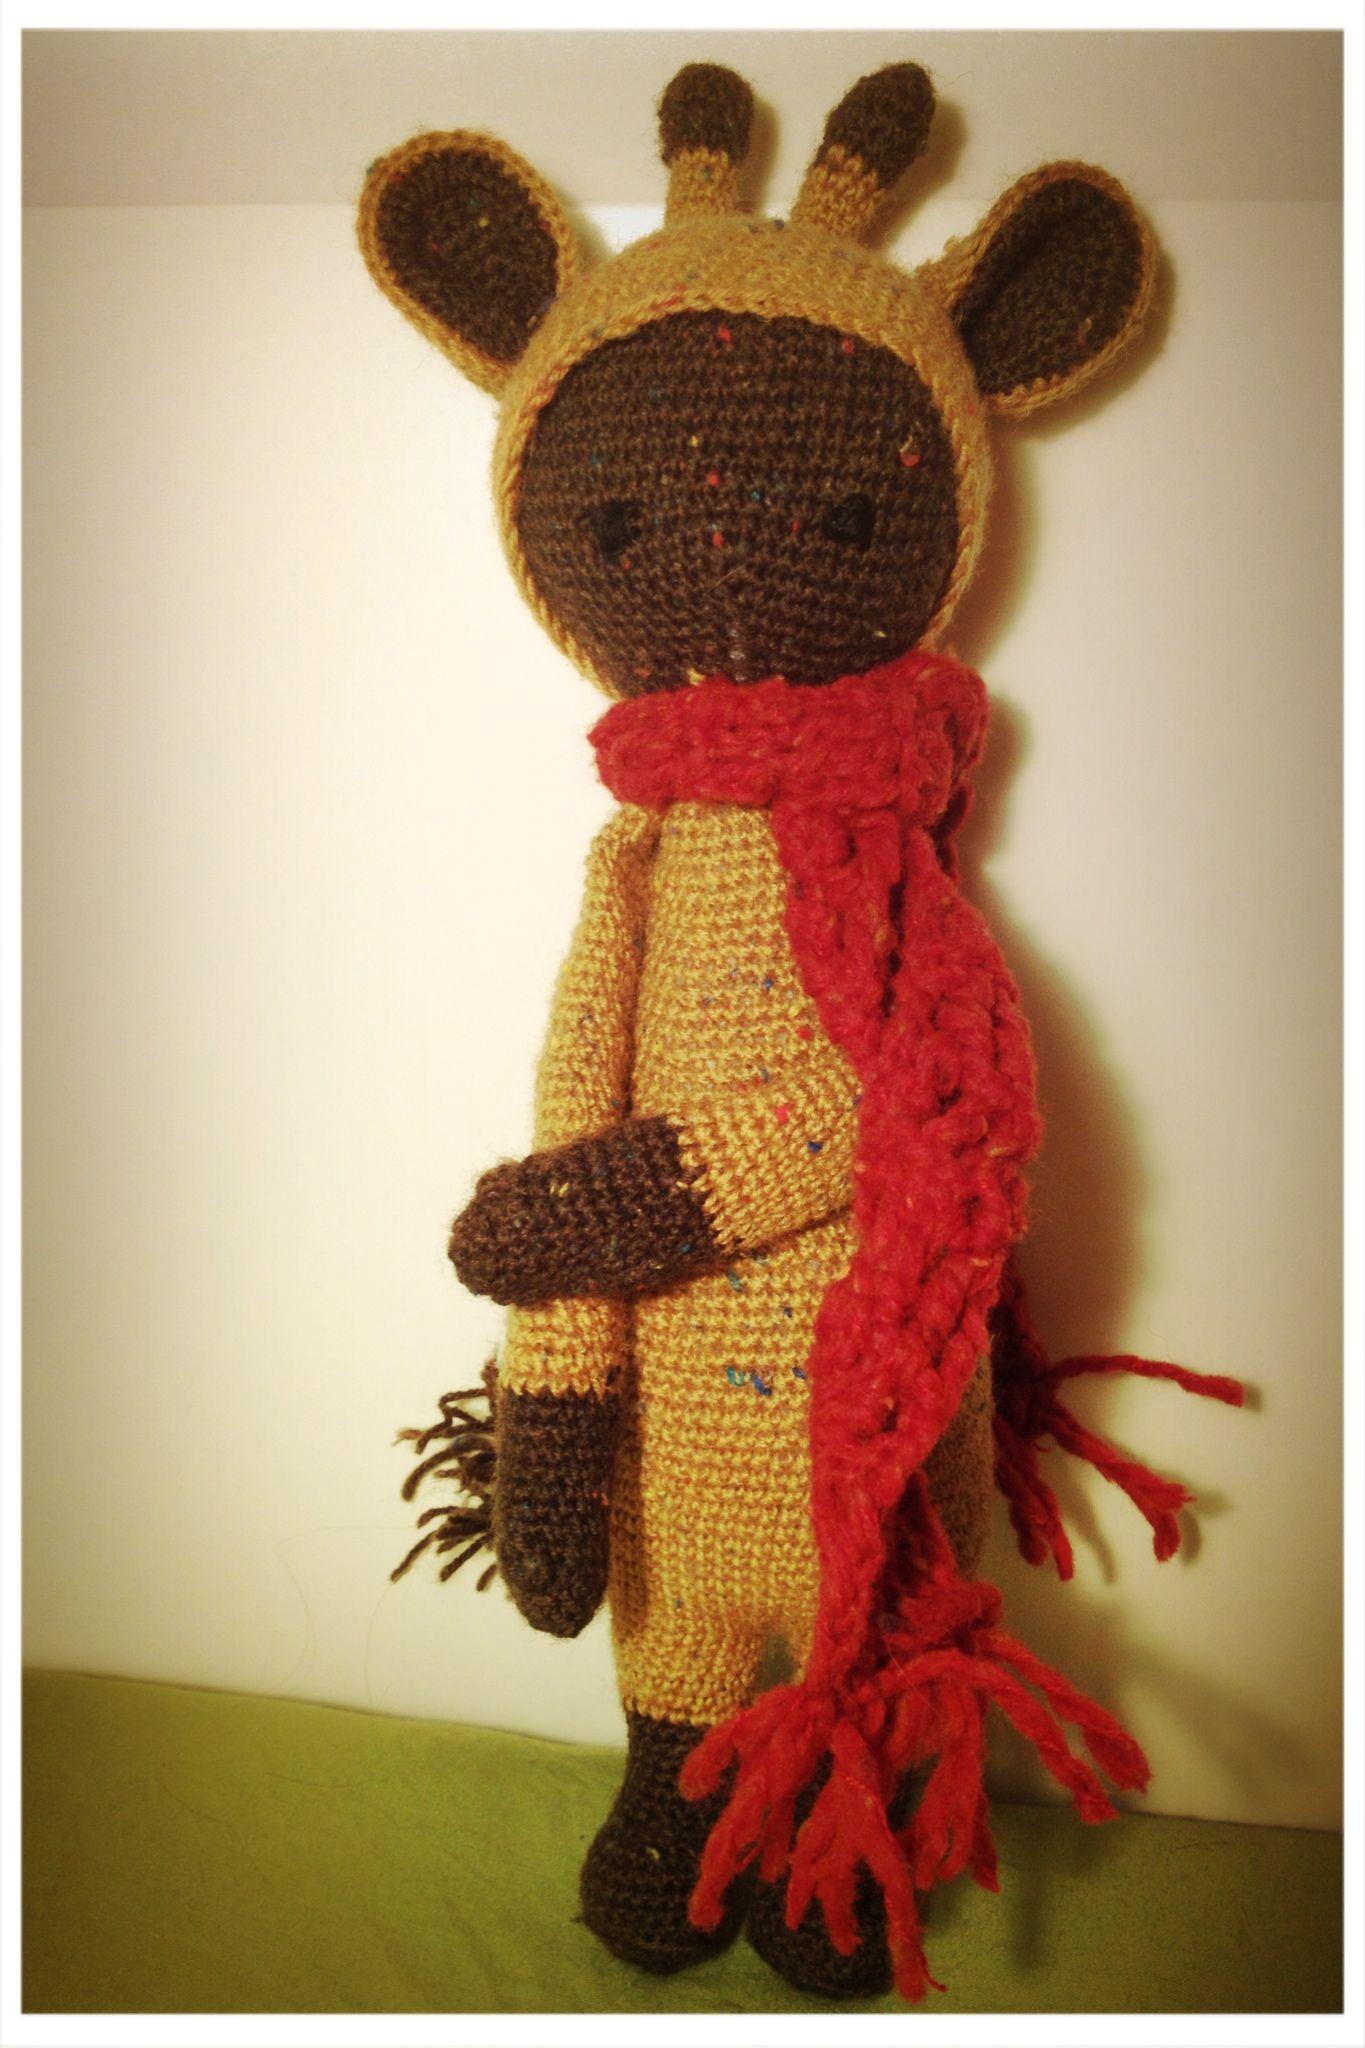 lalylala giraffe mod made by Constanze P. / based on a lalylala doll ...